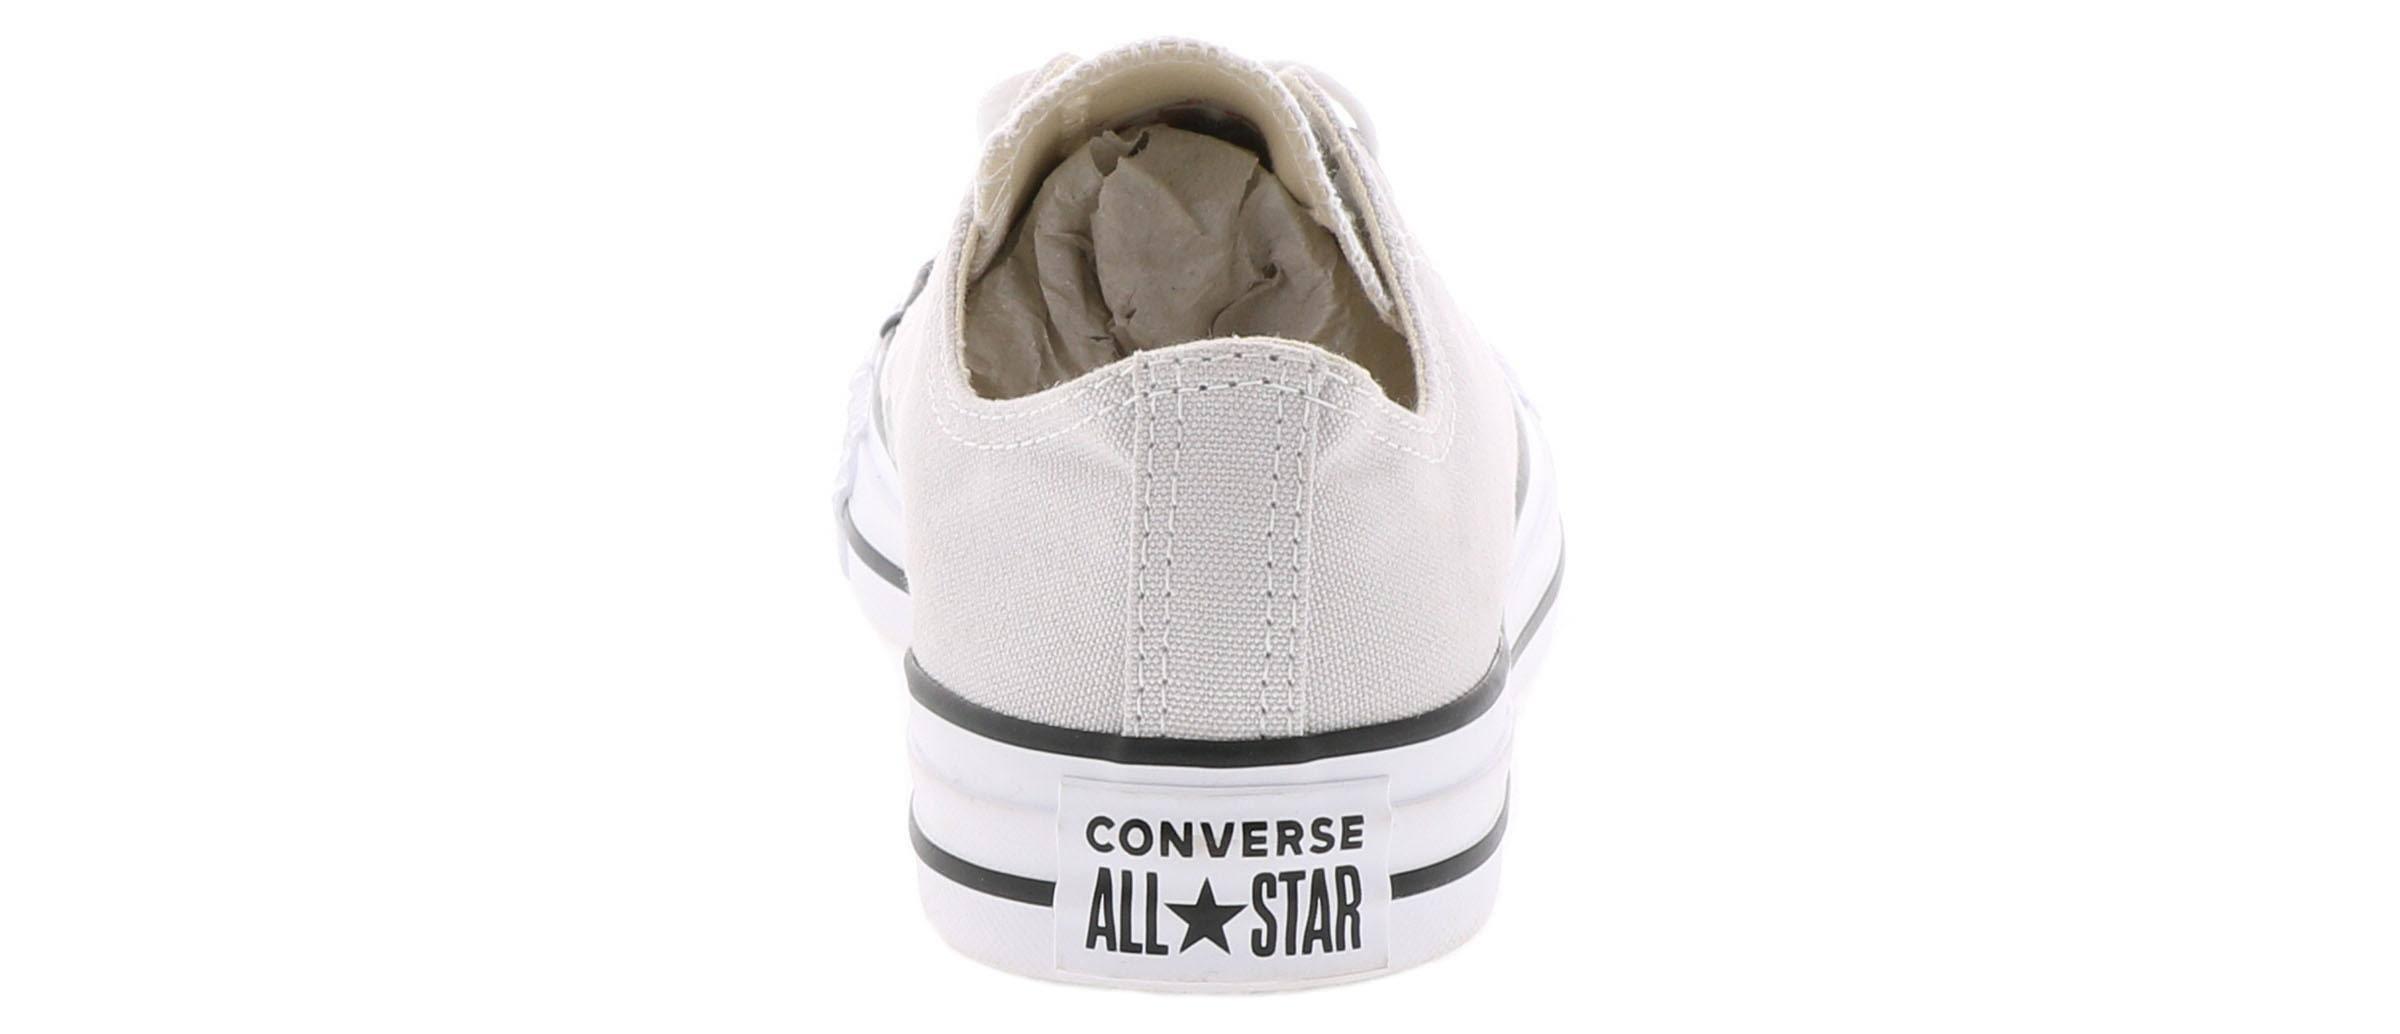 Talla Raton Gris All Star 8 Zapatillas Ox Converse Mujer nw0xHBqXX